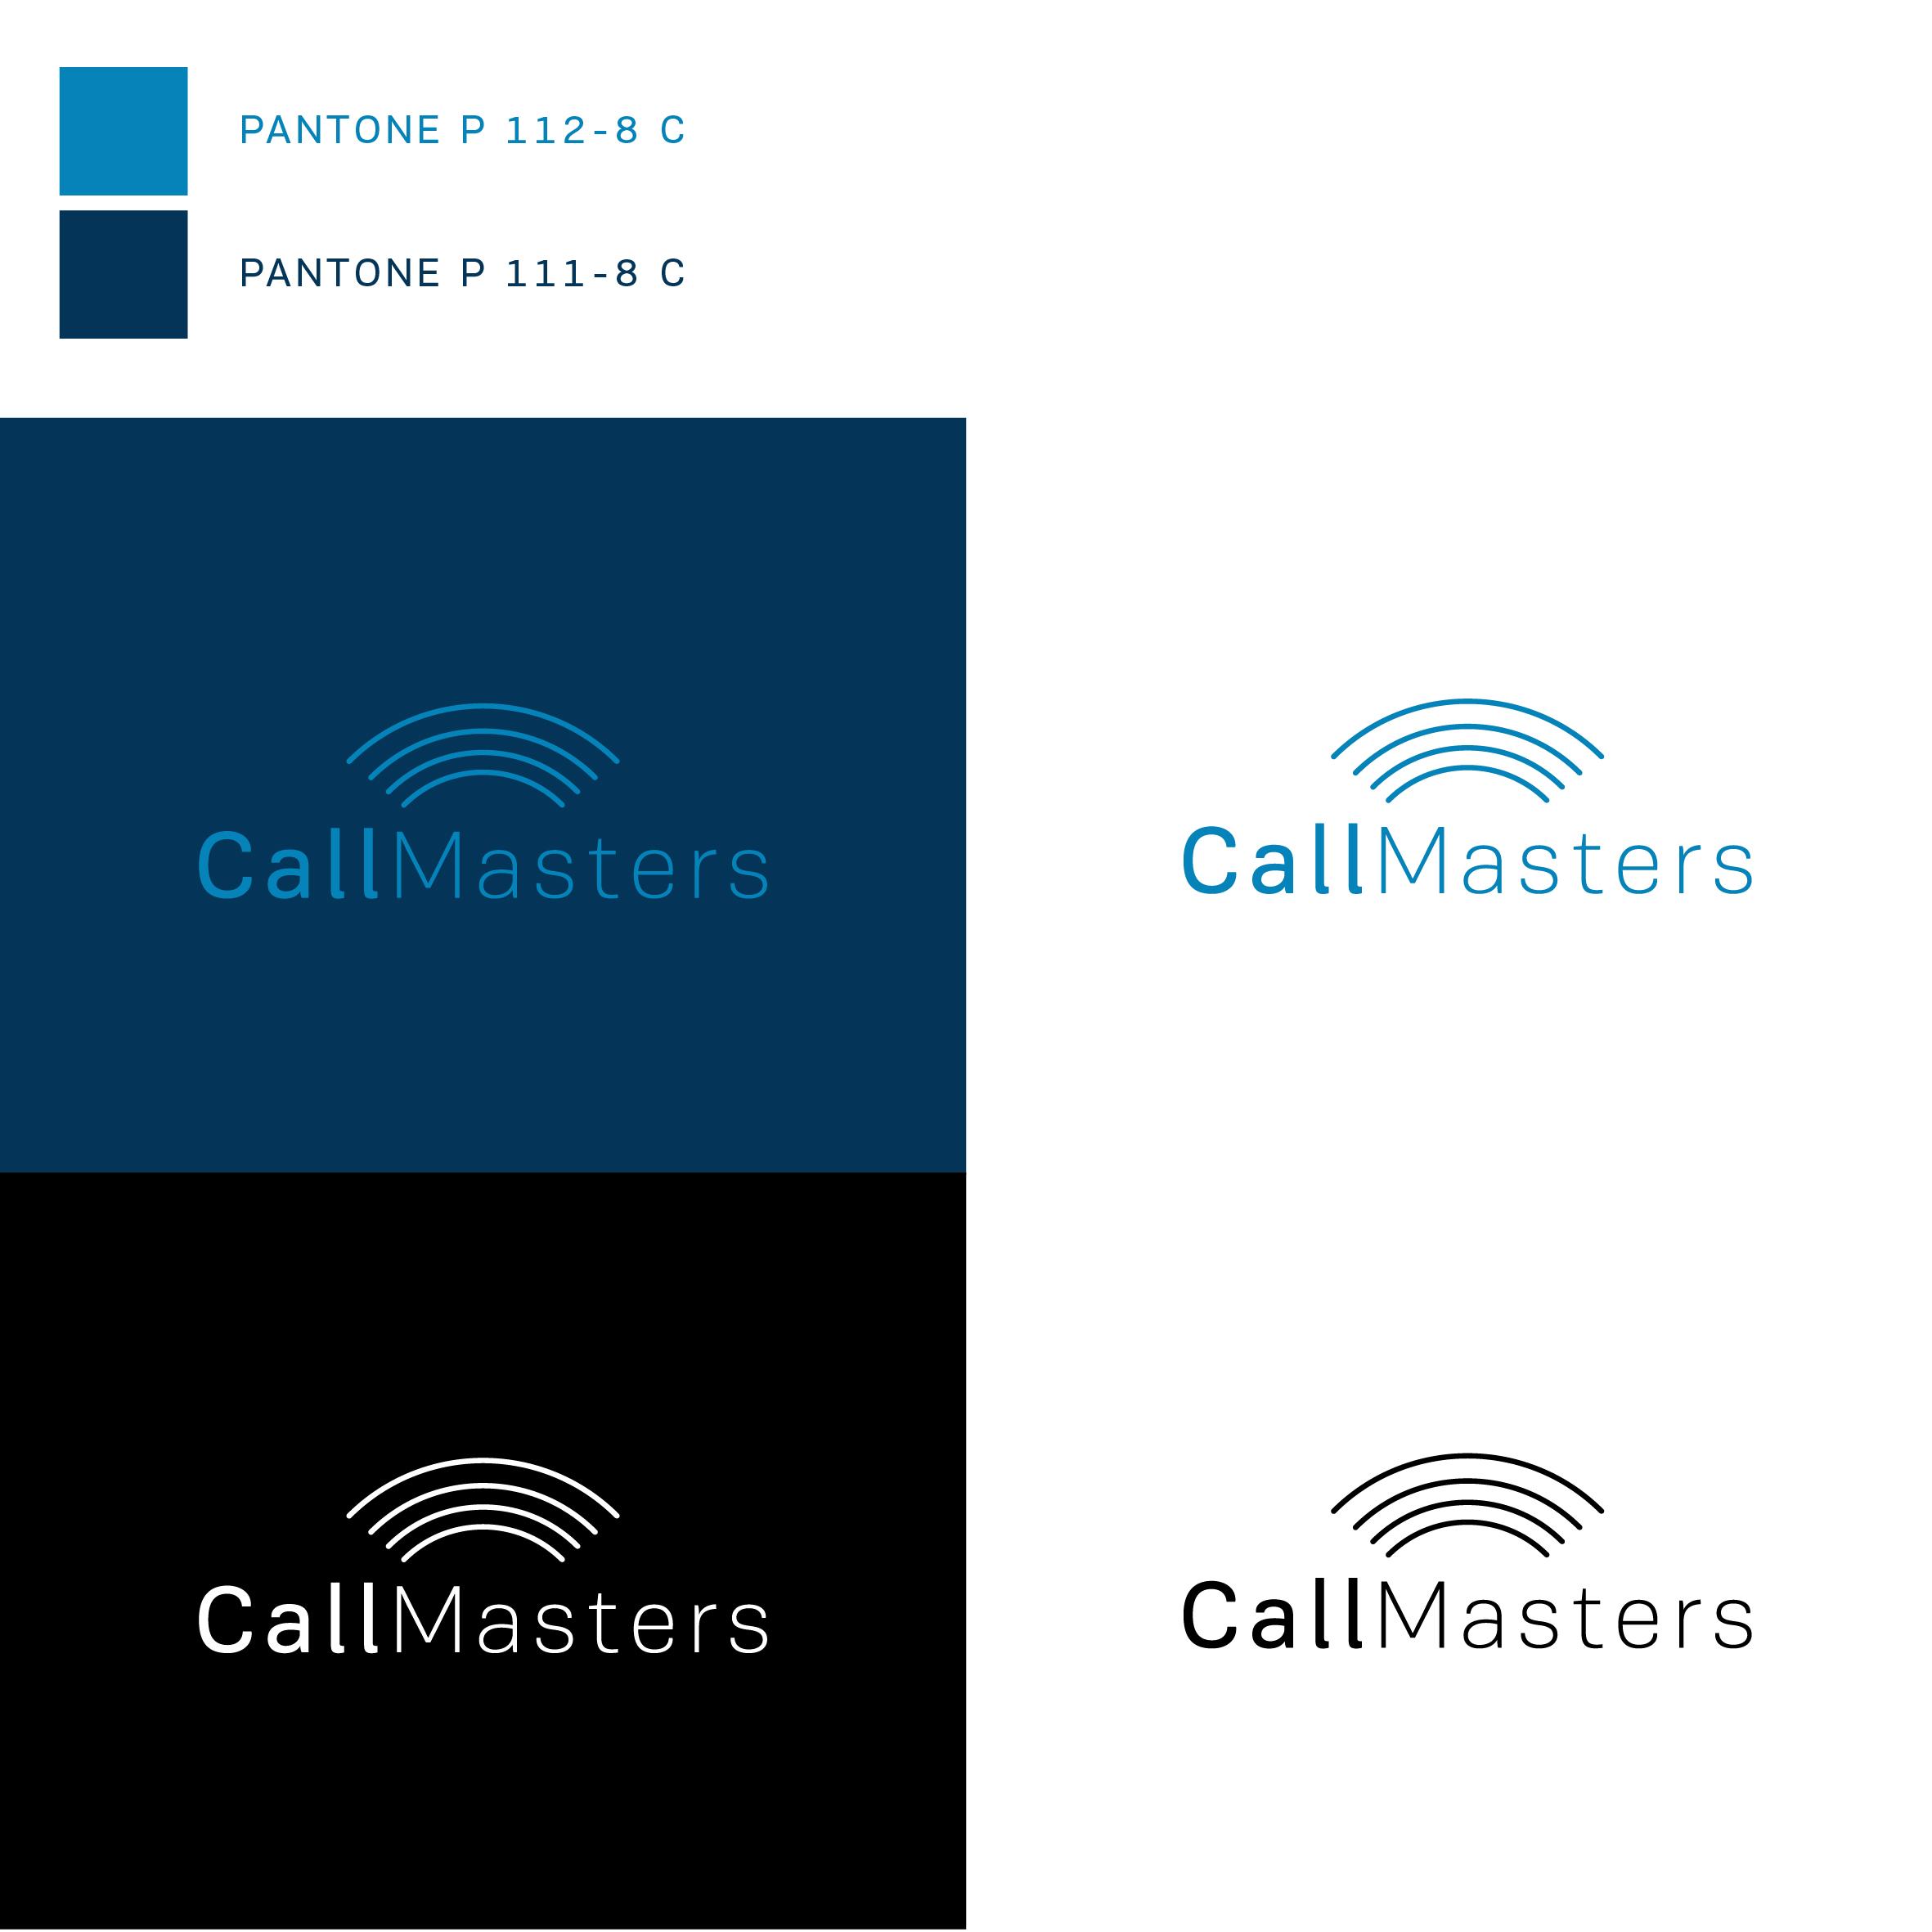 Логотип call-центра Callmasters  фото f_2095b6ad3e0e27c8.jpg